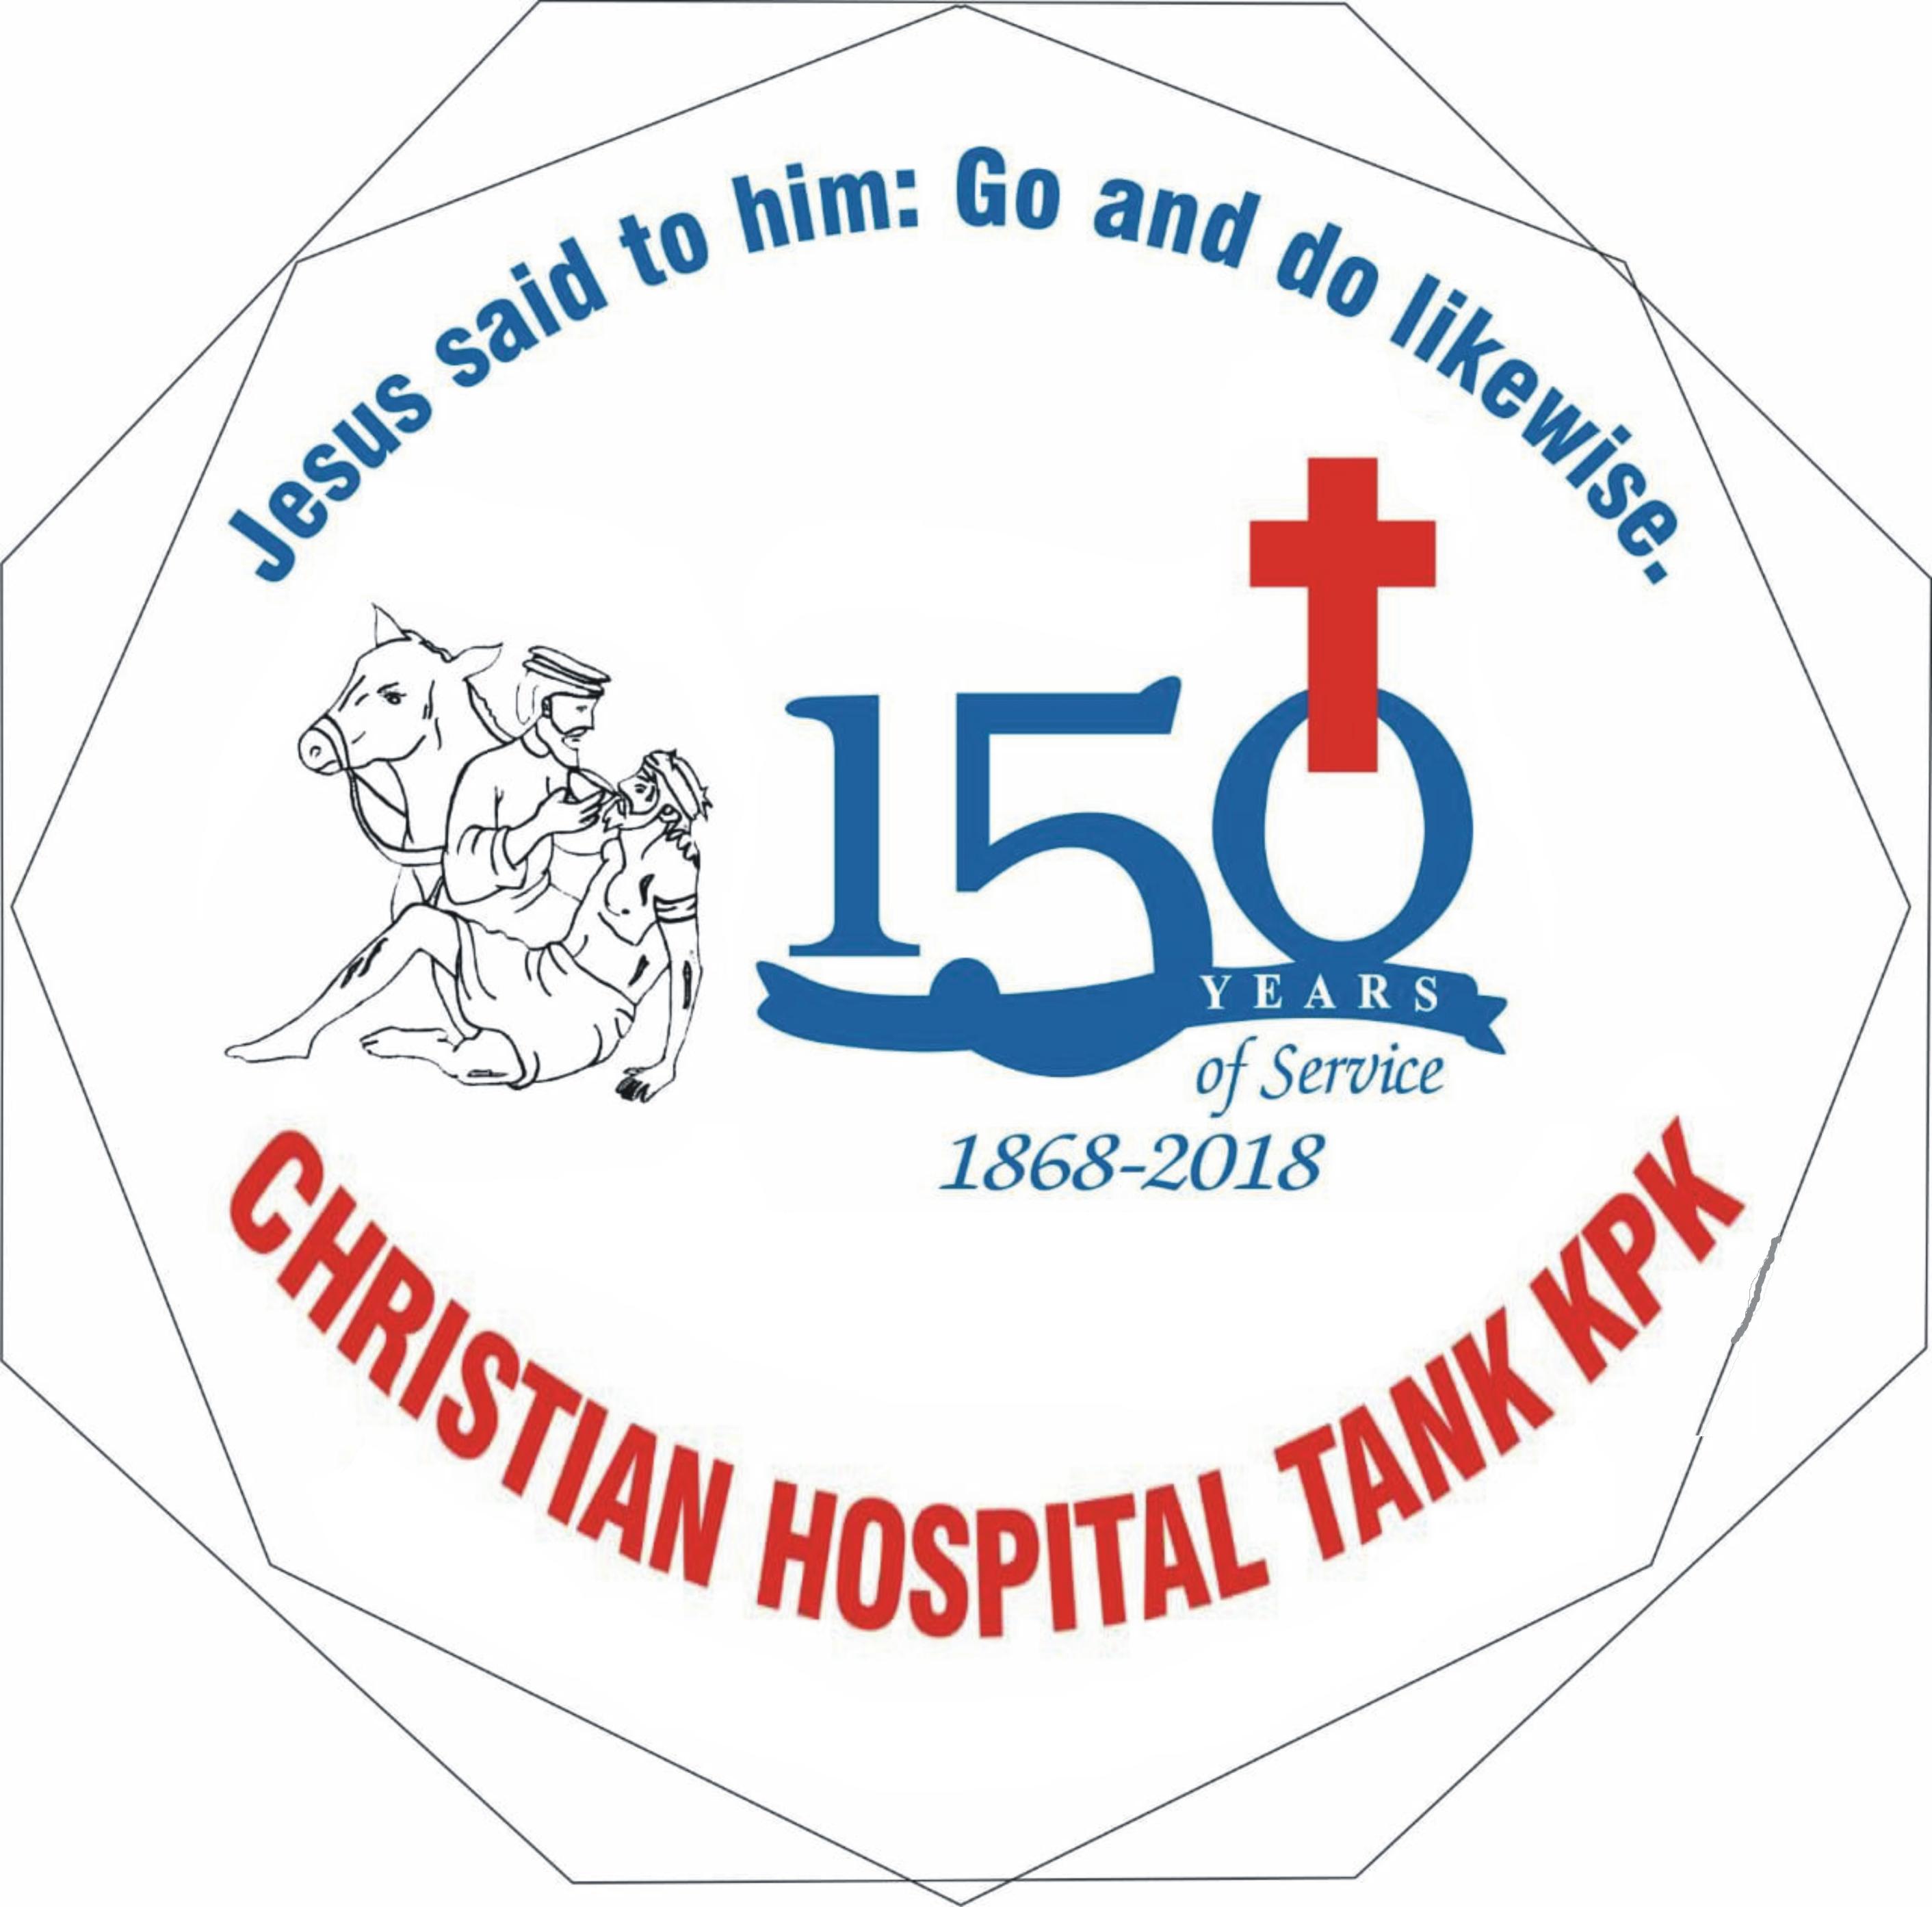 christianhospitaltank